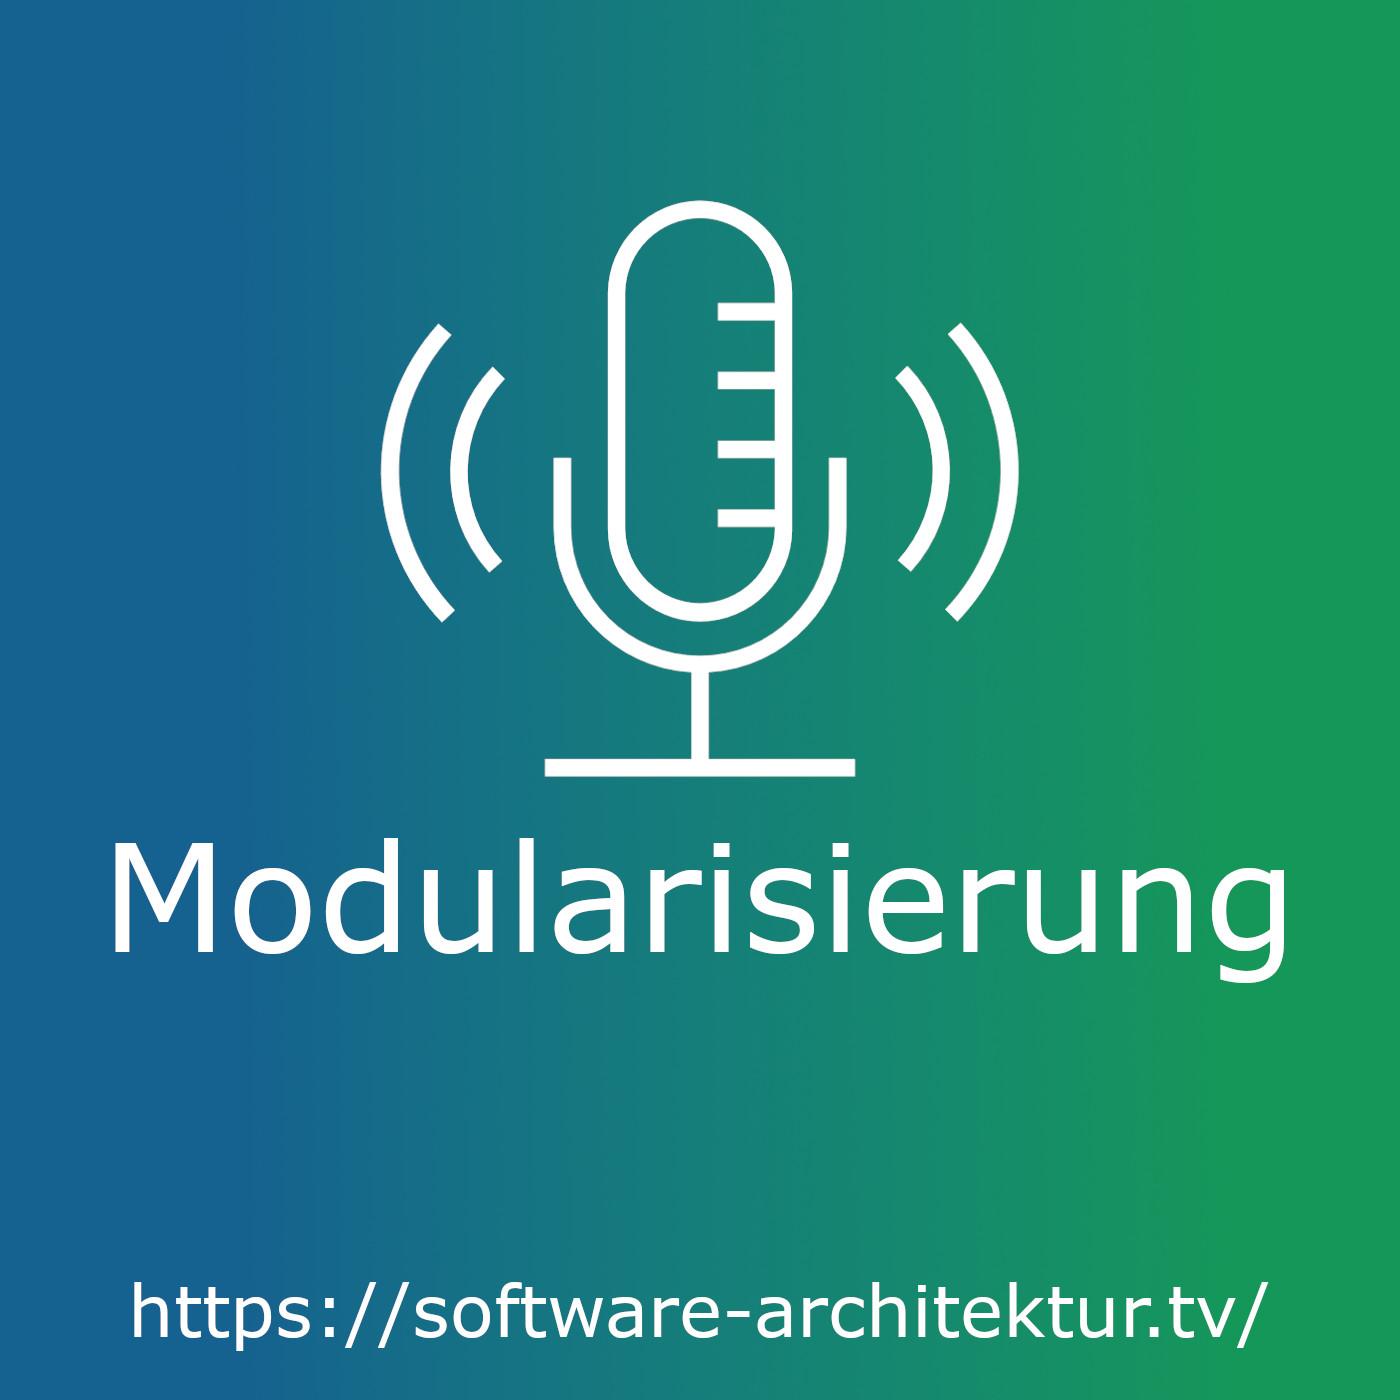 Modularisierung